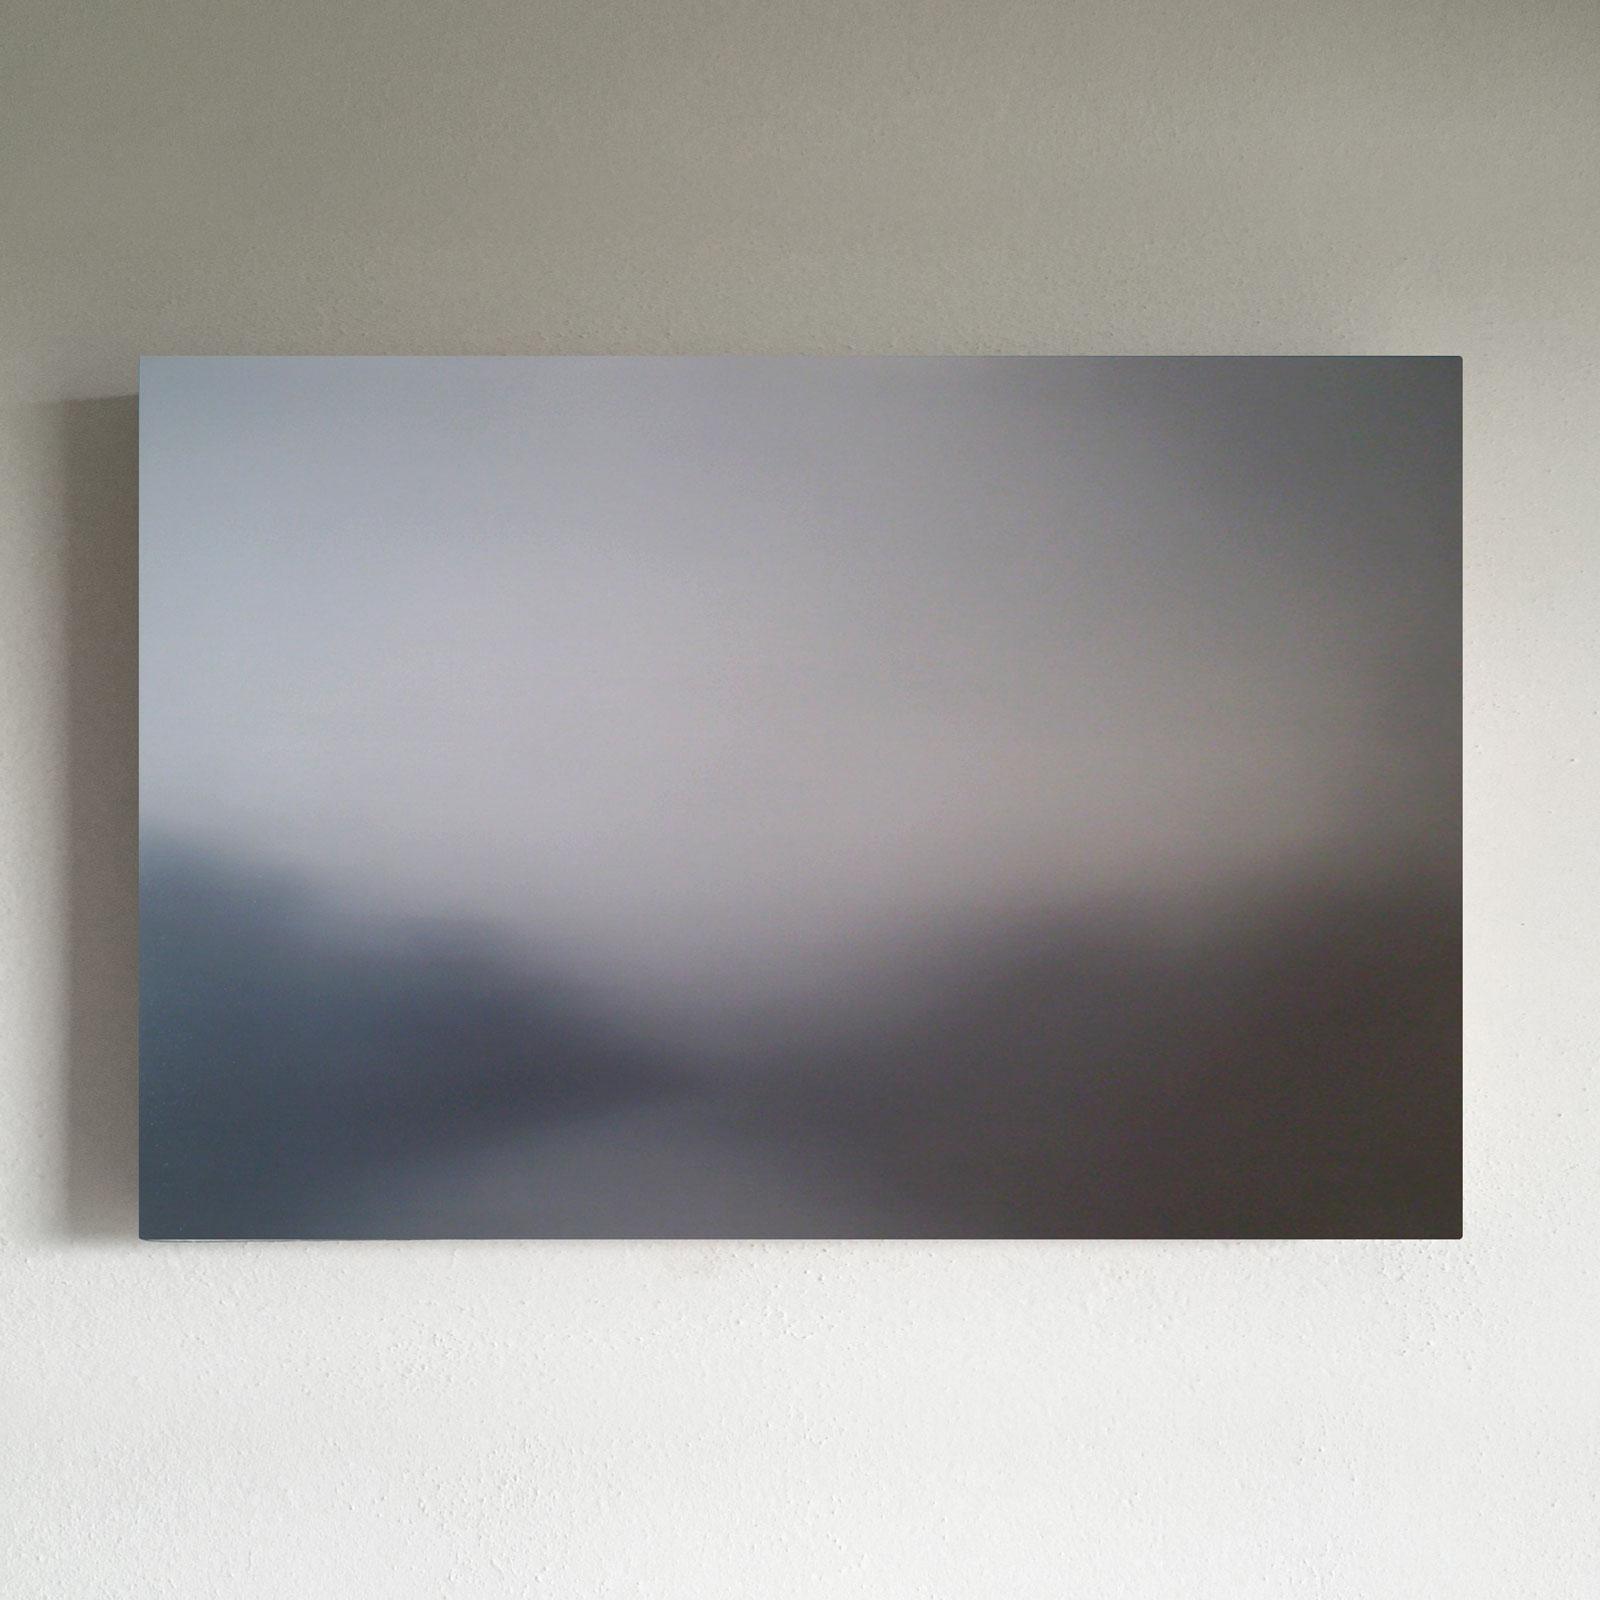 T#22-2009, oil on canvas, 80x120cm, priv. coll.